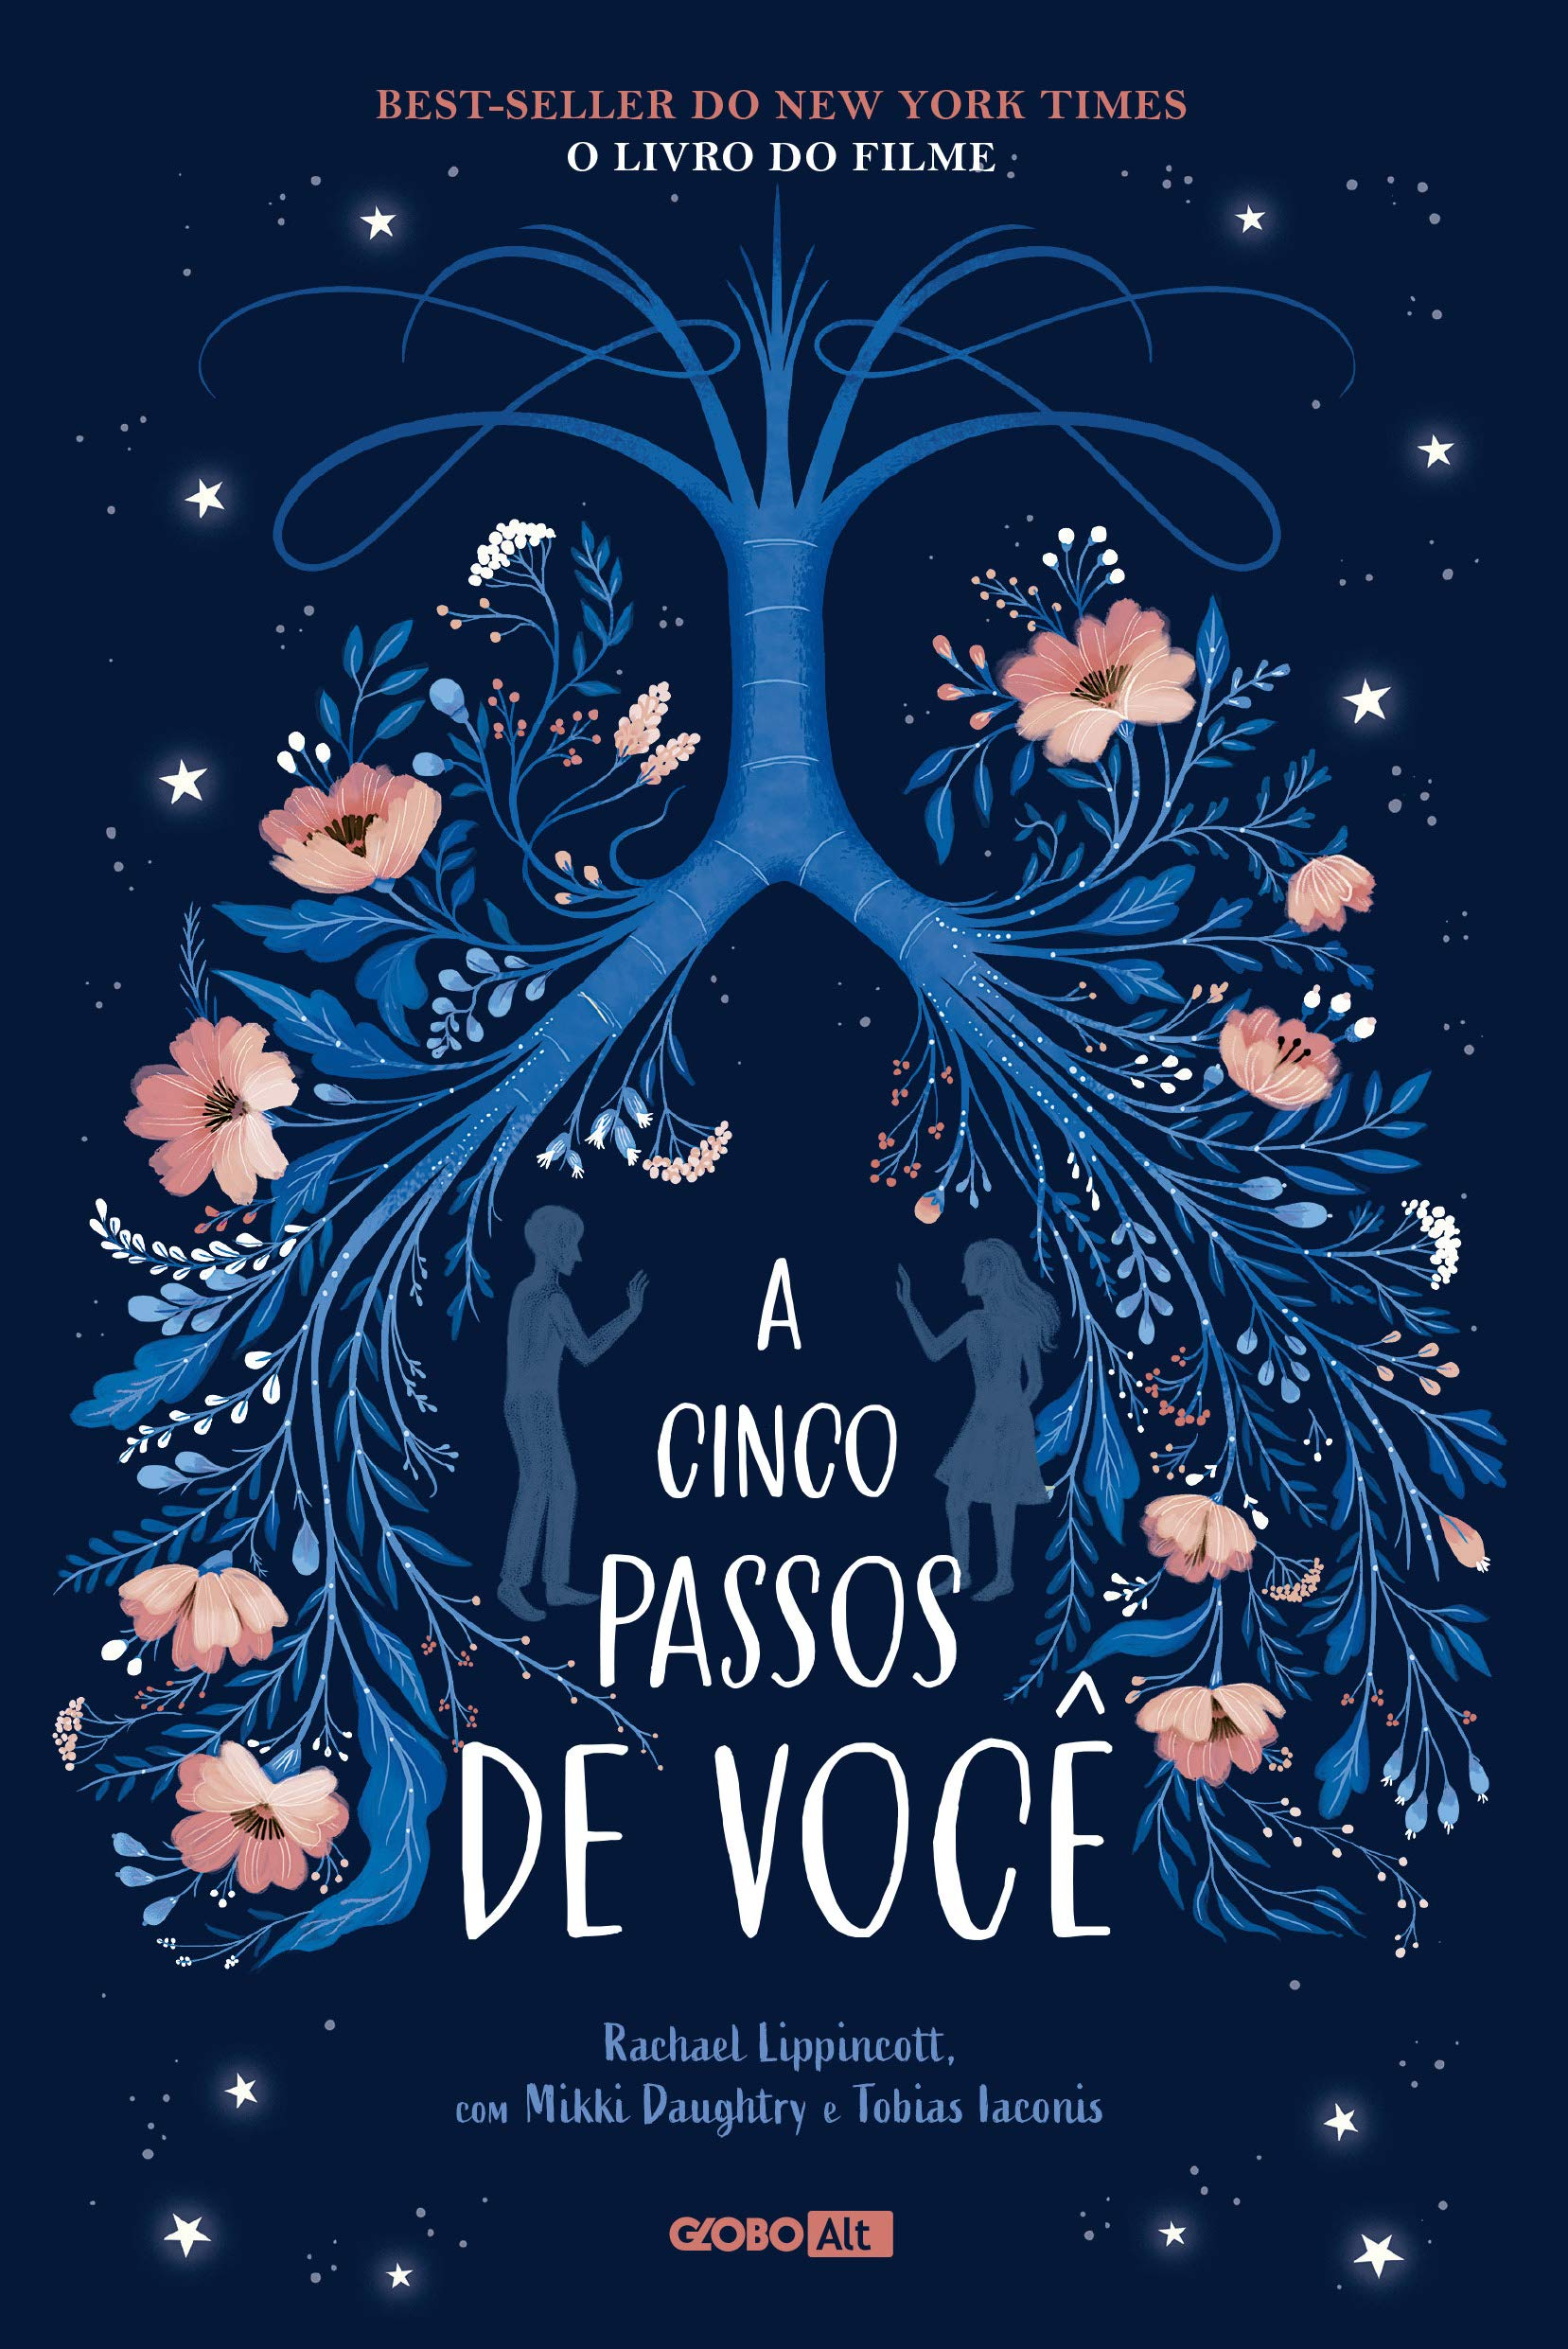 Amazon.com: A Cinco Passos de Voce (Los portugueses hacen Brasil ...